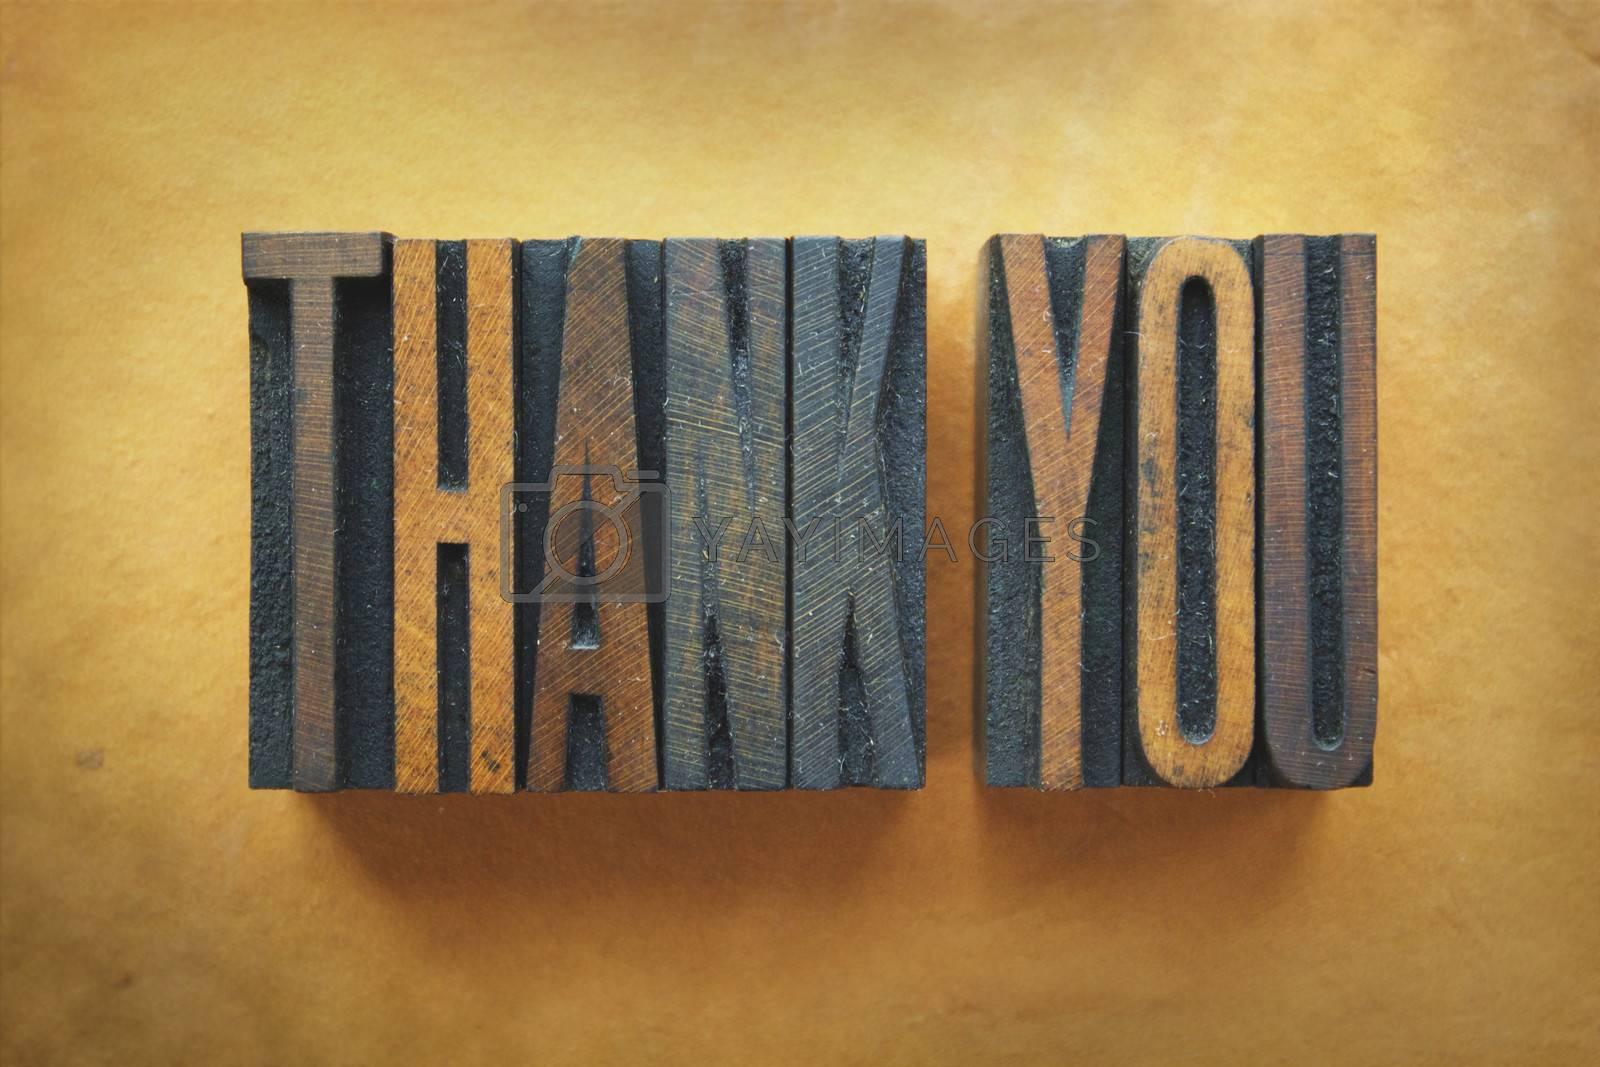 The words THANK YOU written in vintage letterpress type.